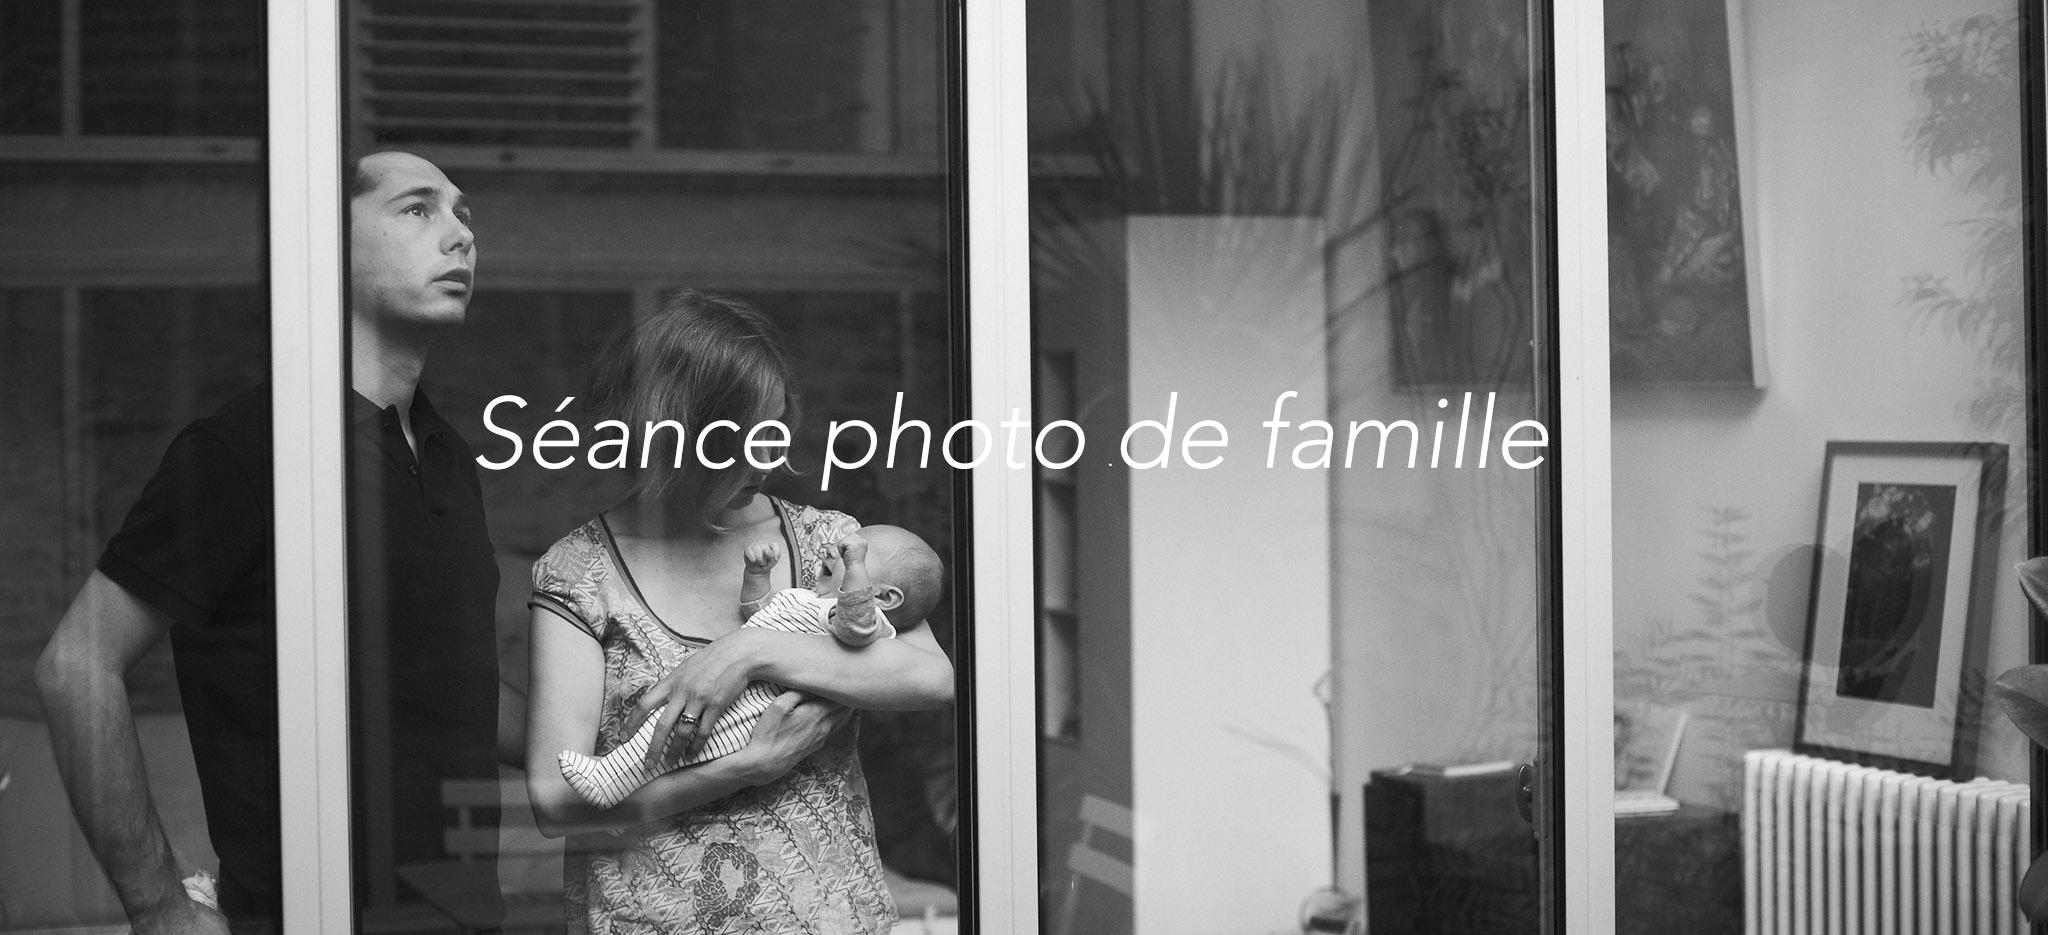 Seance photo de famille photographe de famille nantes